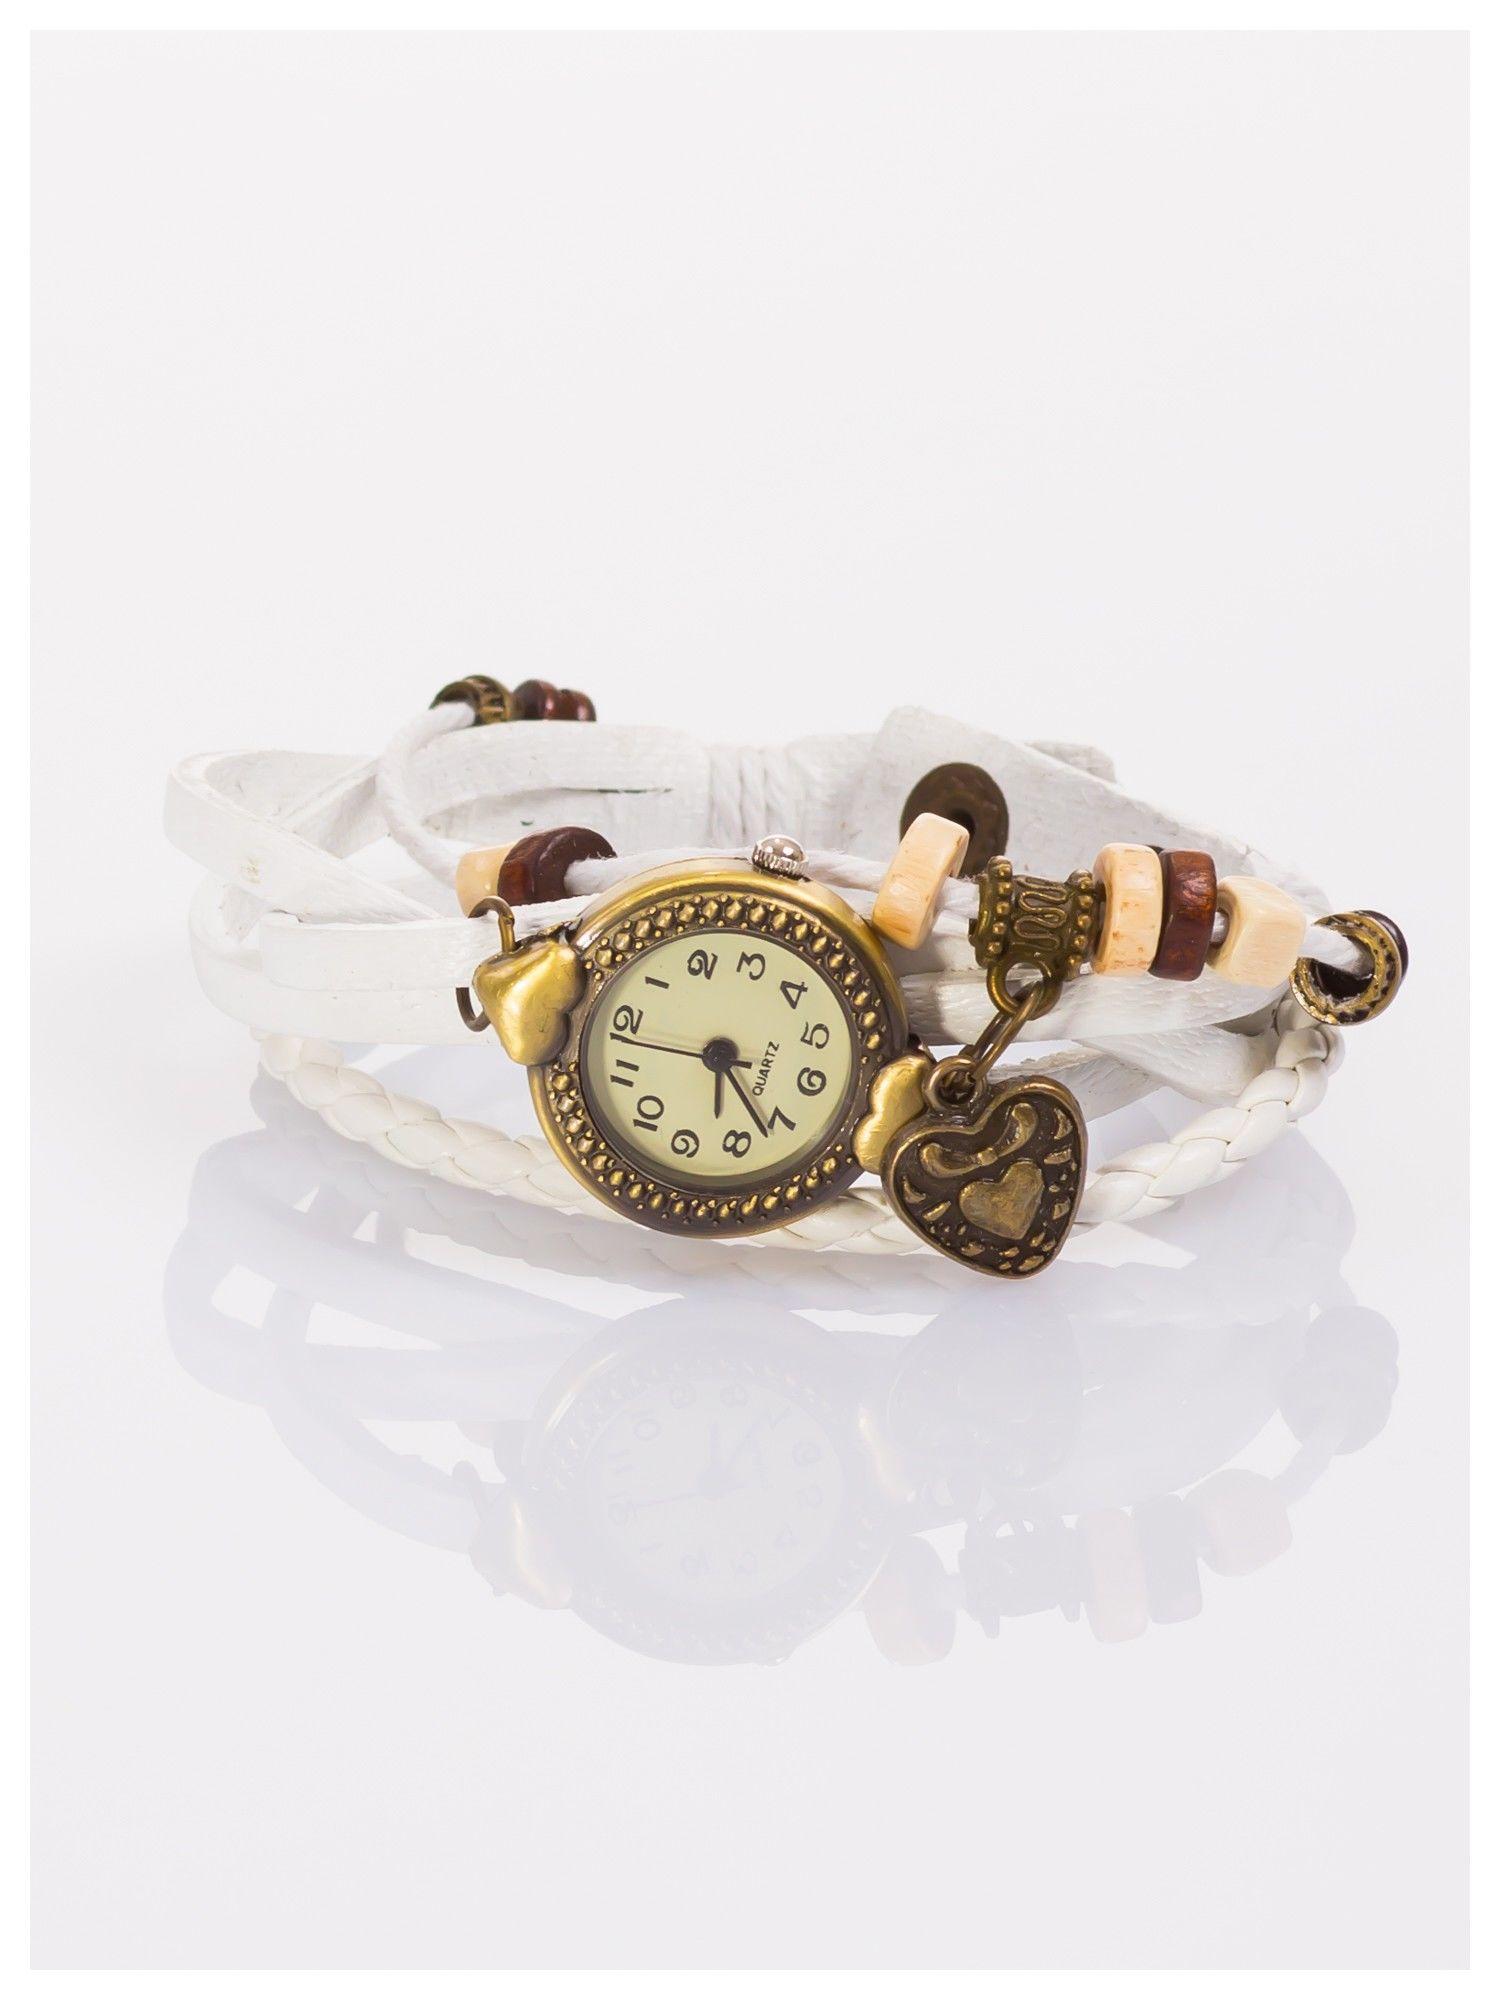 Damski zegarek na skórzanej bransolecie z charmsami                                  zdj.                                  1